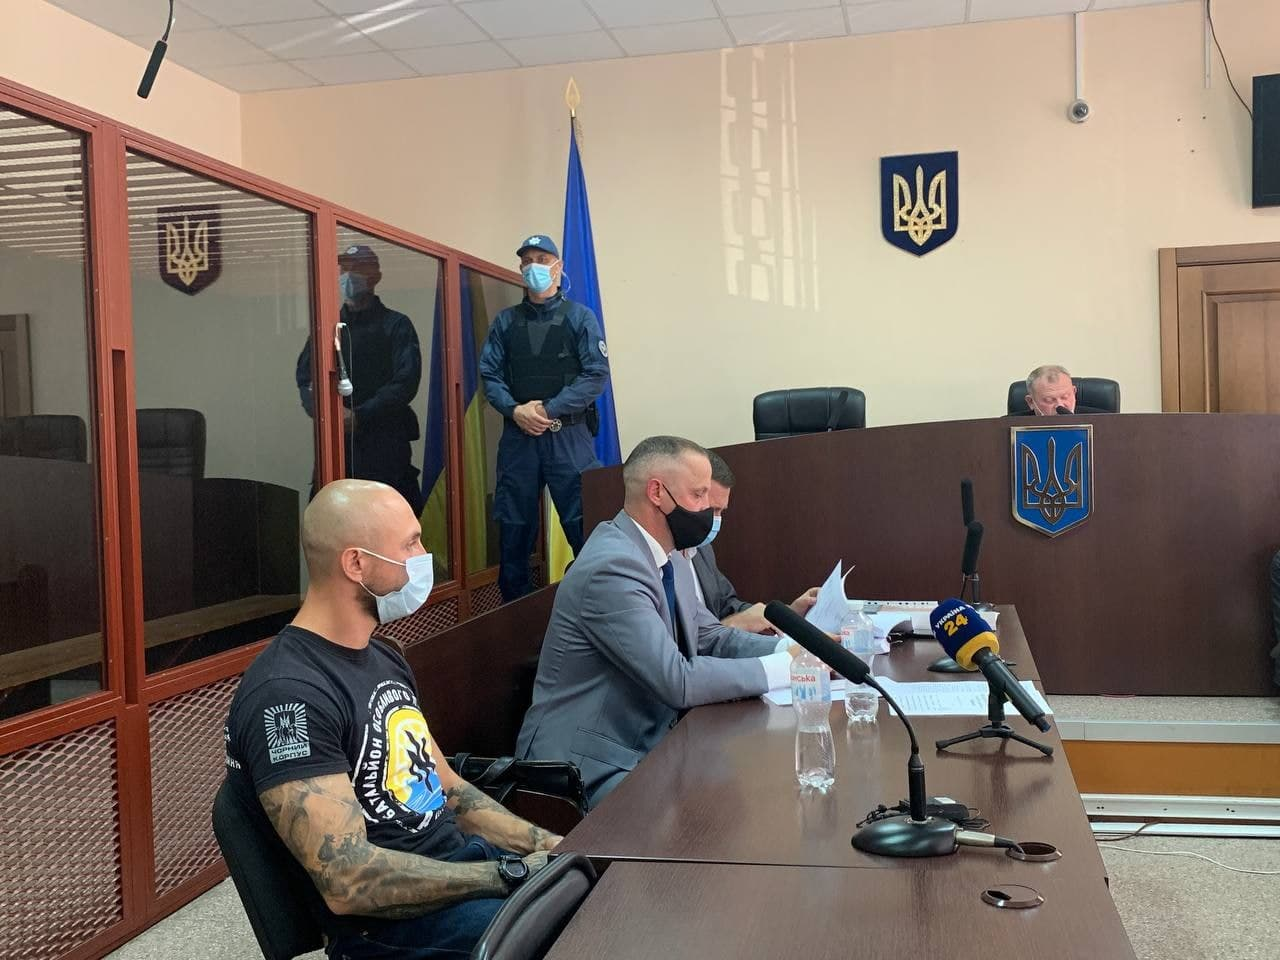 Столкновения с полицией под Офисом президента: двух членов Нацкорпуса отправили под арест